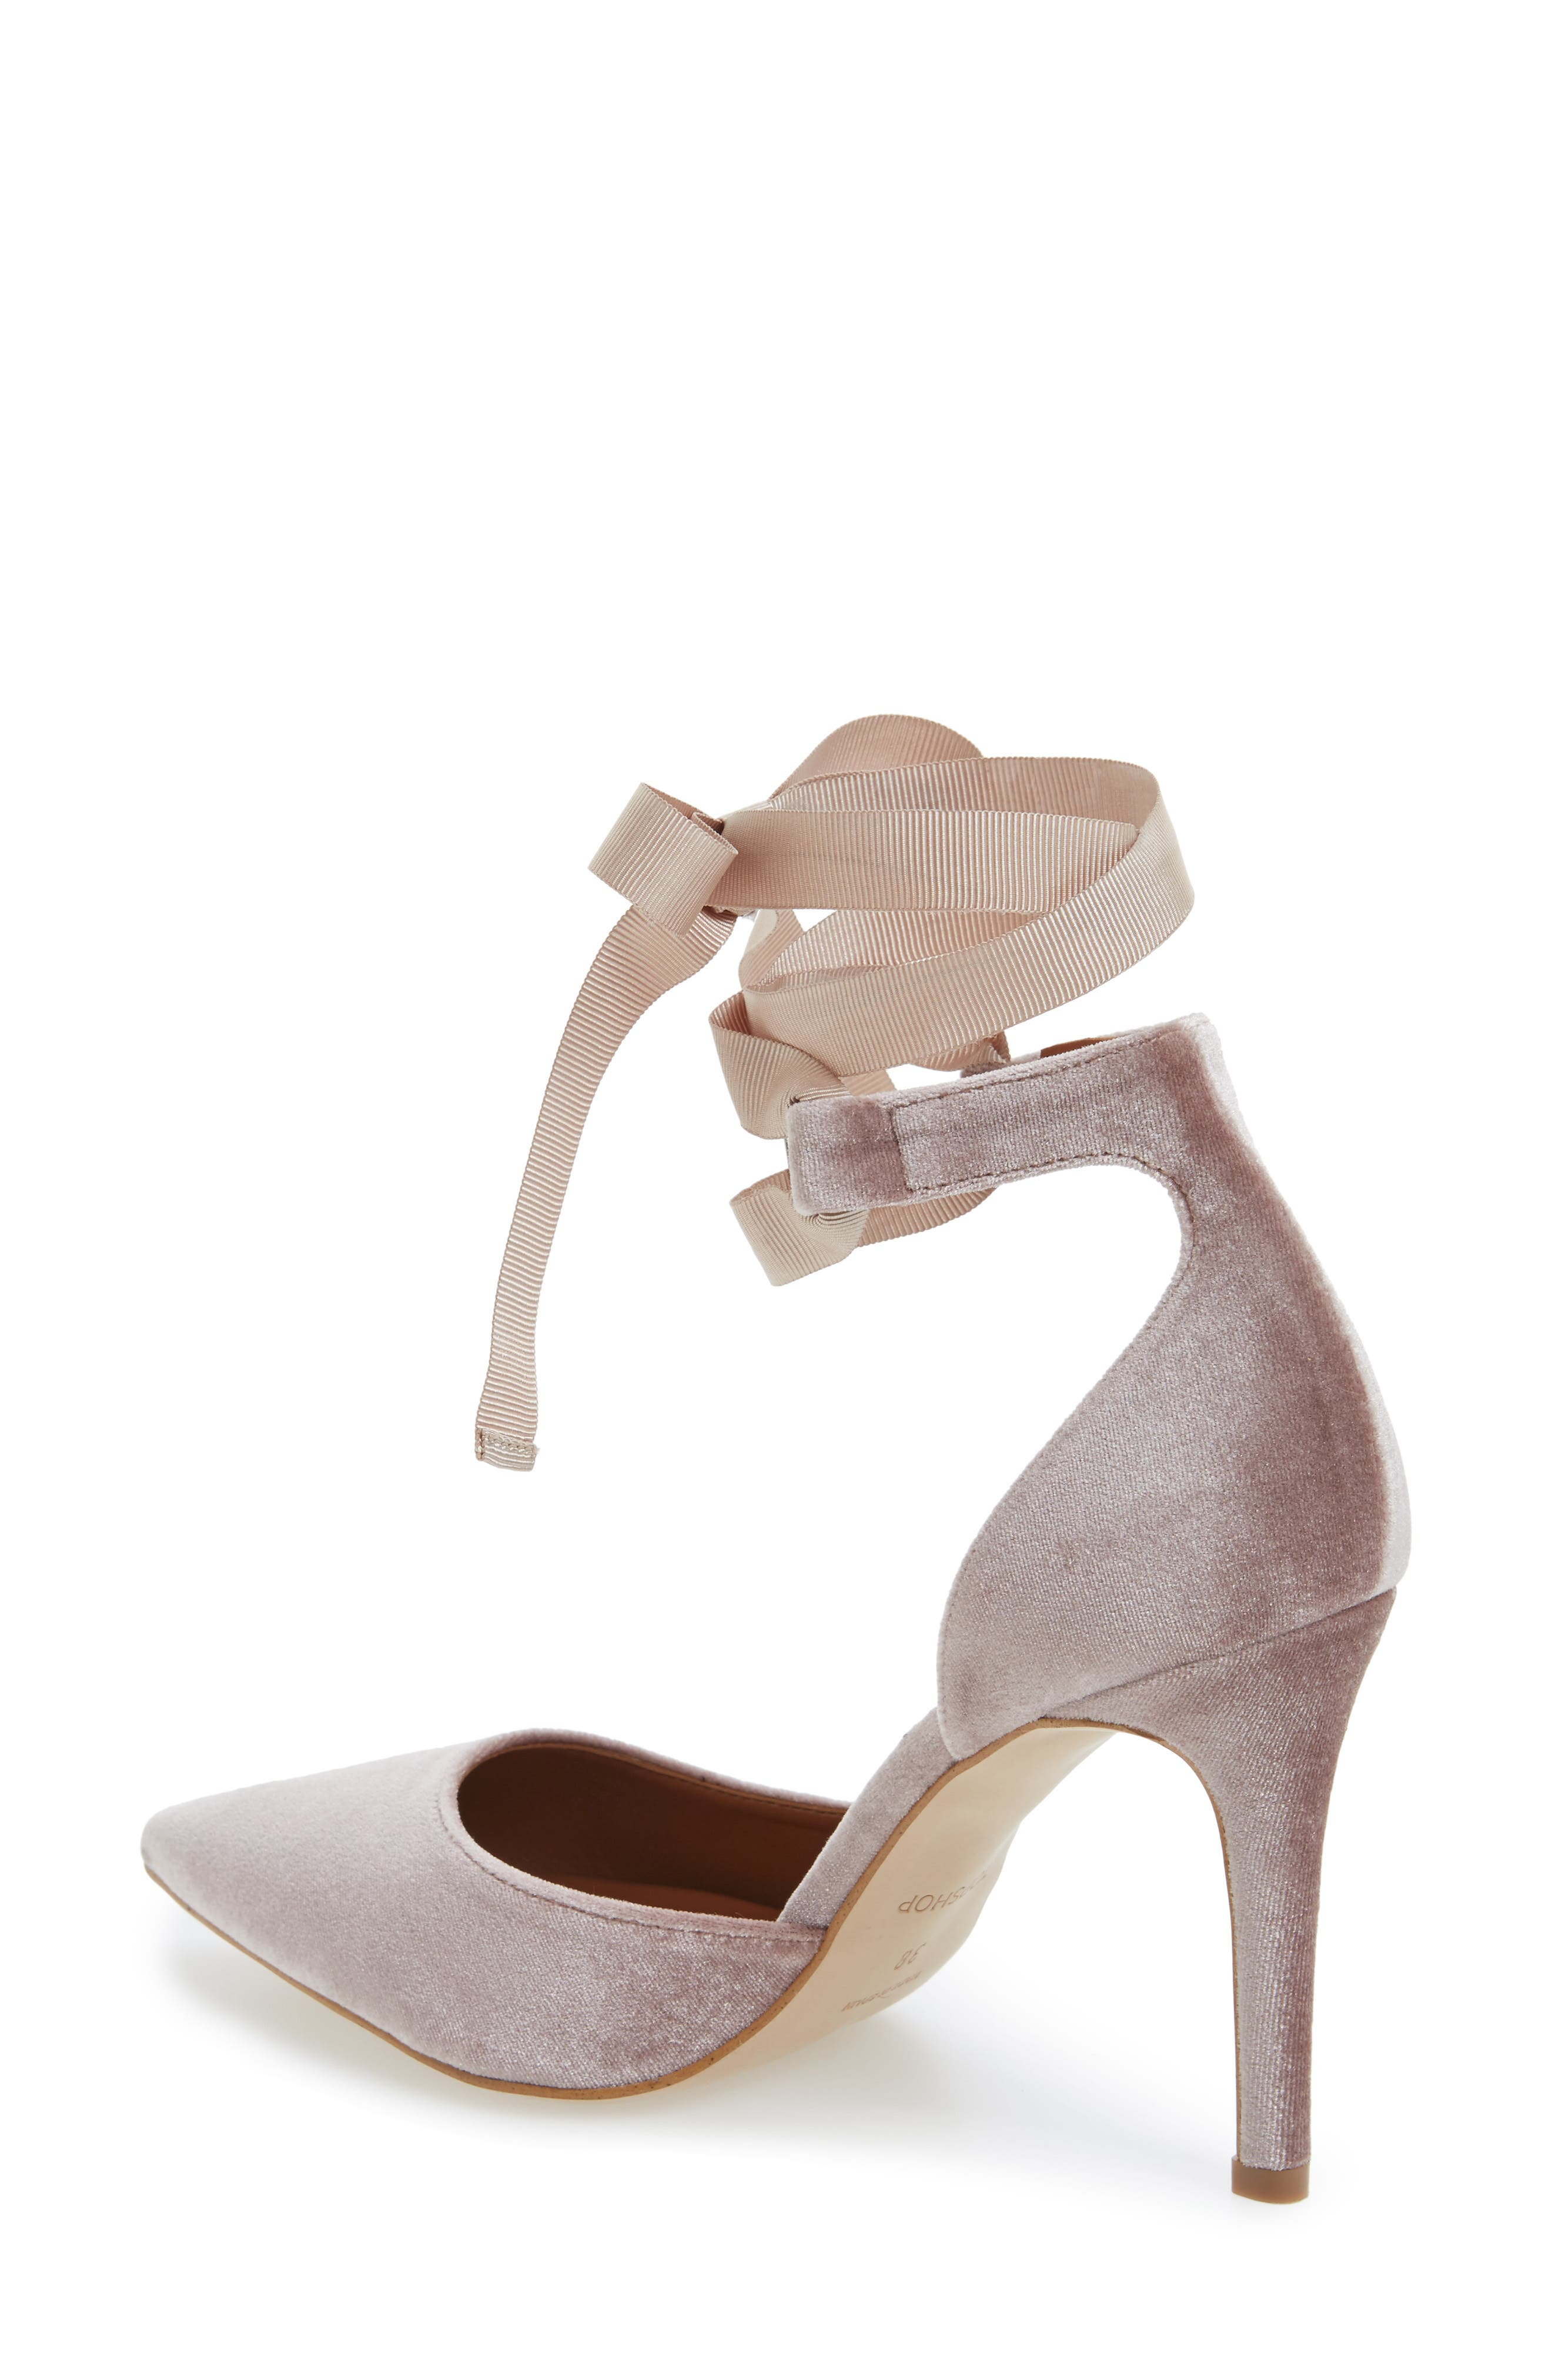 Alternate Image 2  - Topshop Graceful Ankle Tie d'Orsay Pump (Women)